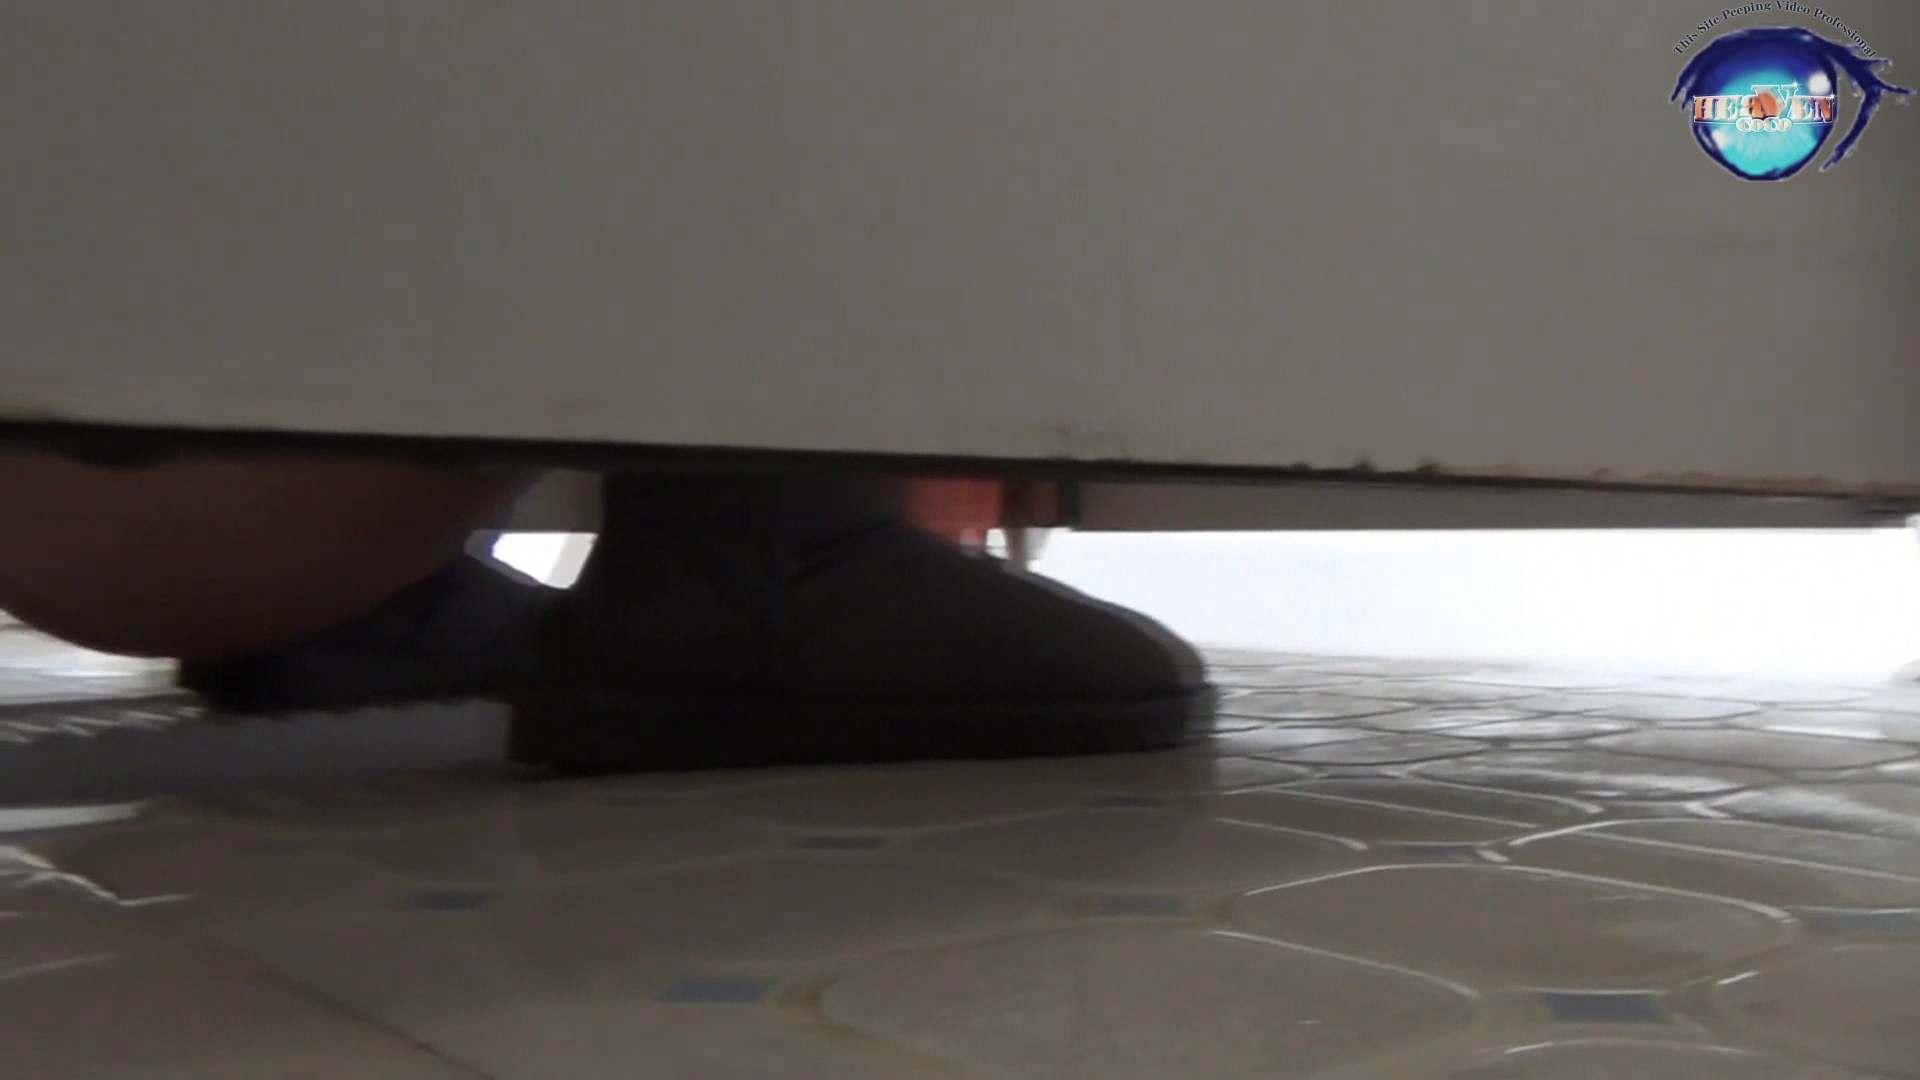 GOD HAND 芸術大学盗撮‼vol.55 盗撮師作品 盗撮動画紹介 105pic 26